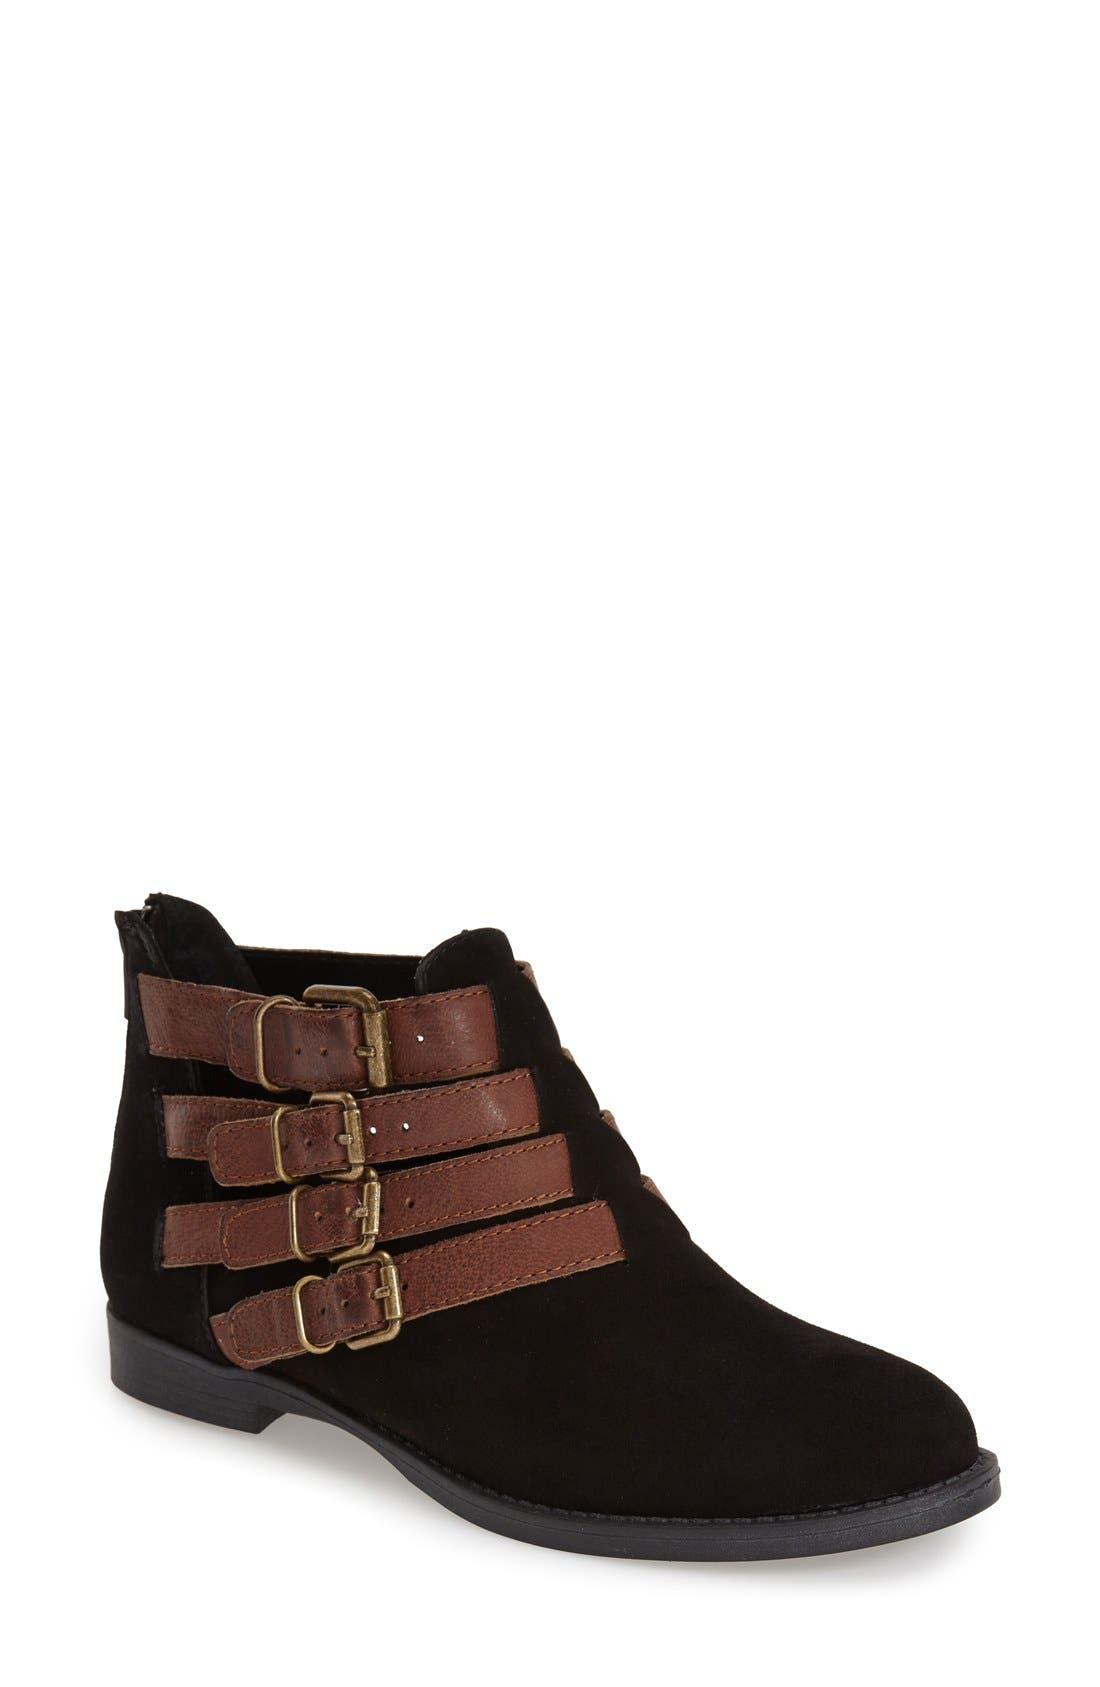 Alternate Image 1 Selected - Bella Vita 'Ronan' Buckle Leather Bootie (Women) (Online Only)